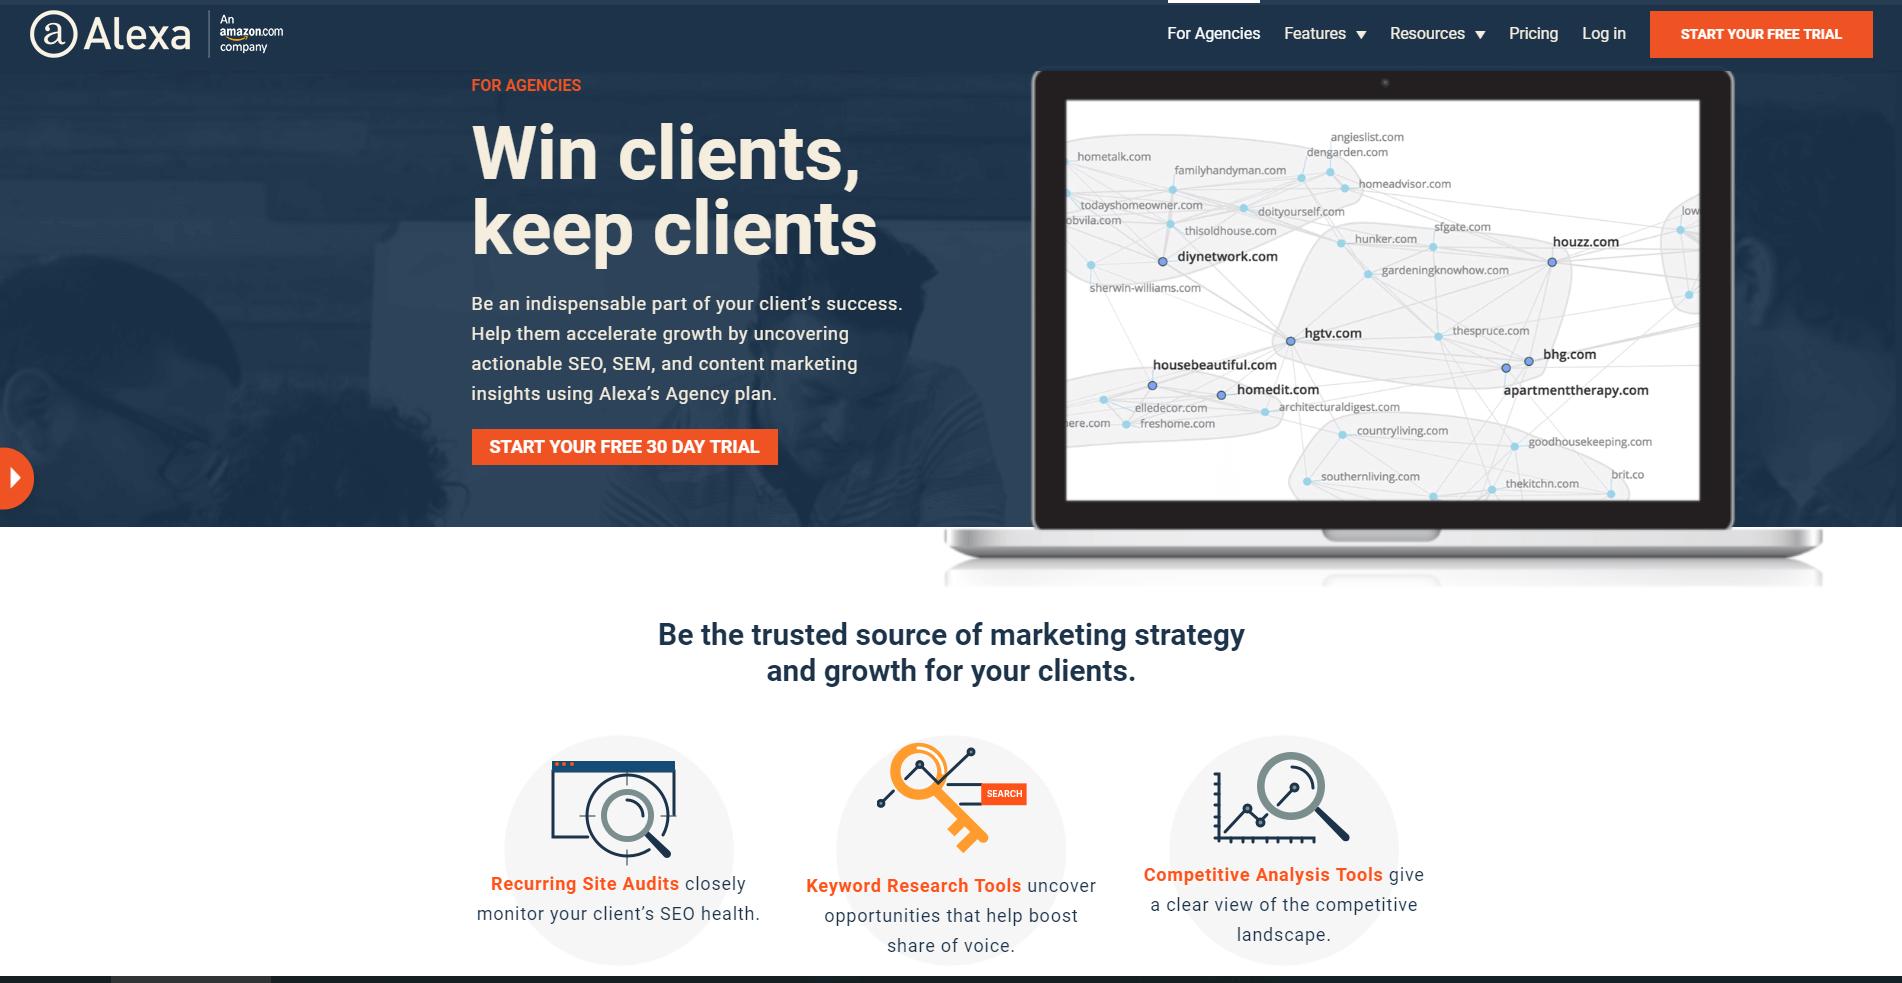 Alexa - win clients, keep clients